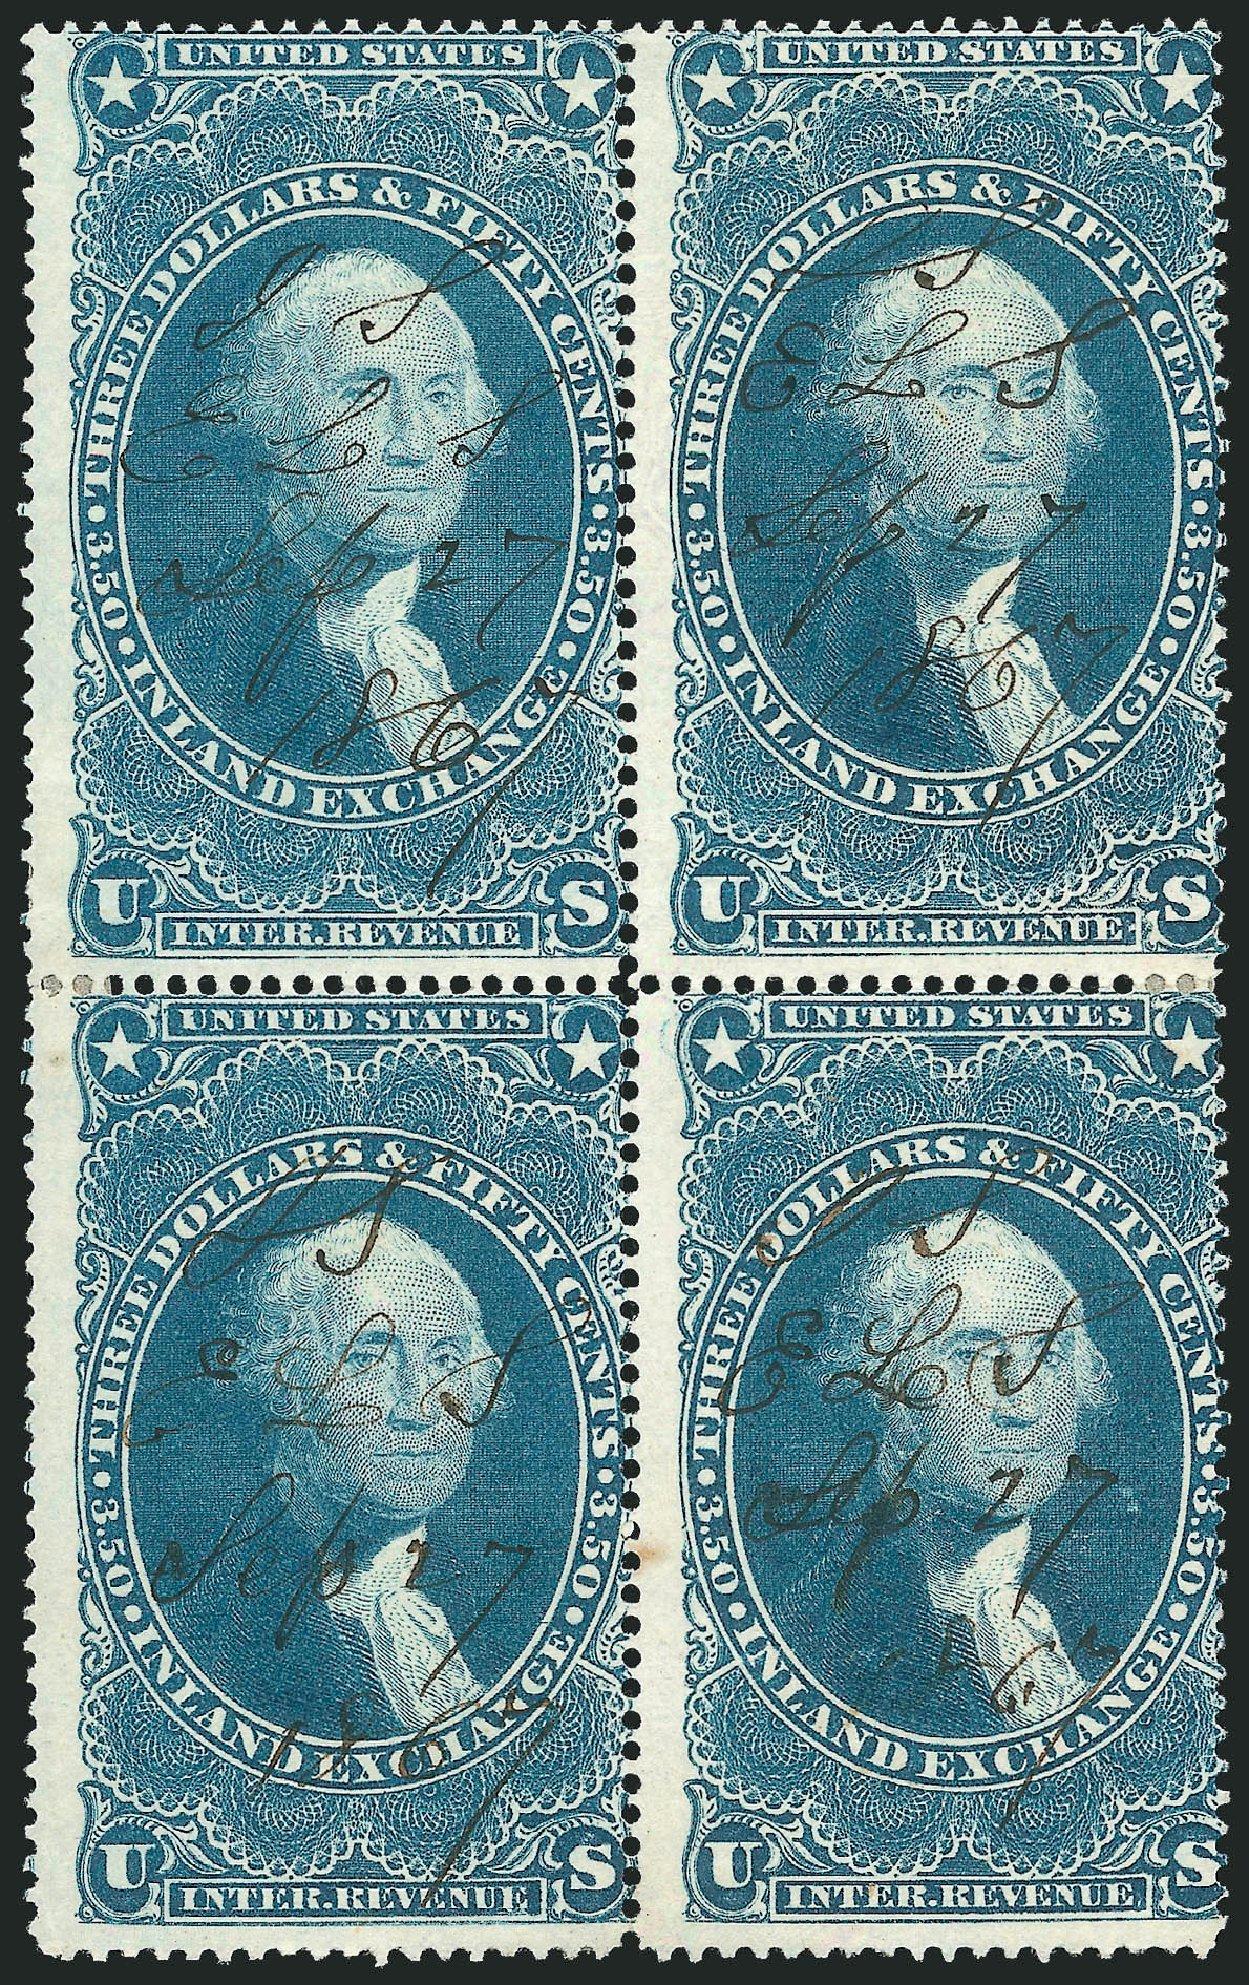 Price of US Stamps Scott Catalog R87: US$3.50 1863 Revenue Inland Exchange. Robert Siegel Auction Galleries, Jun 2015, Sale 1100, Lot 159